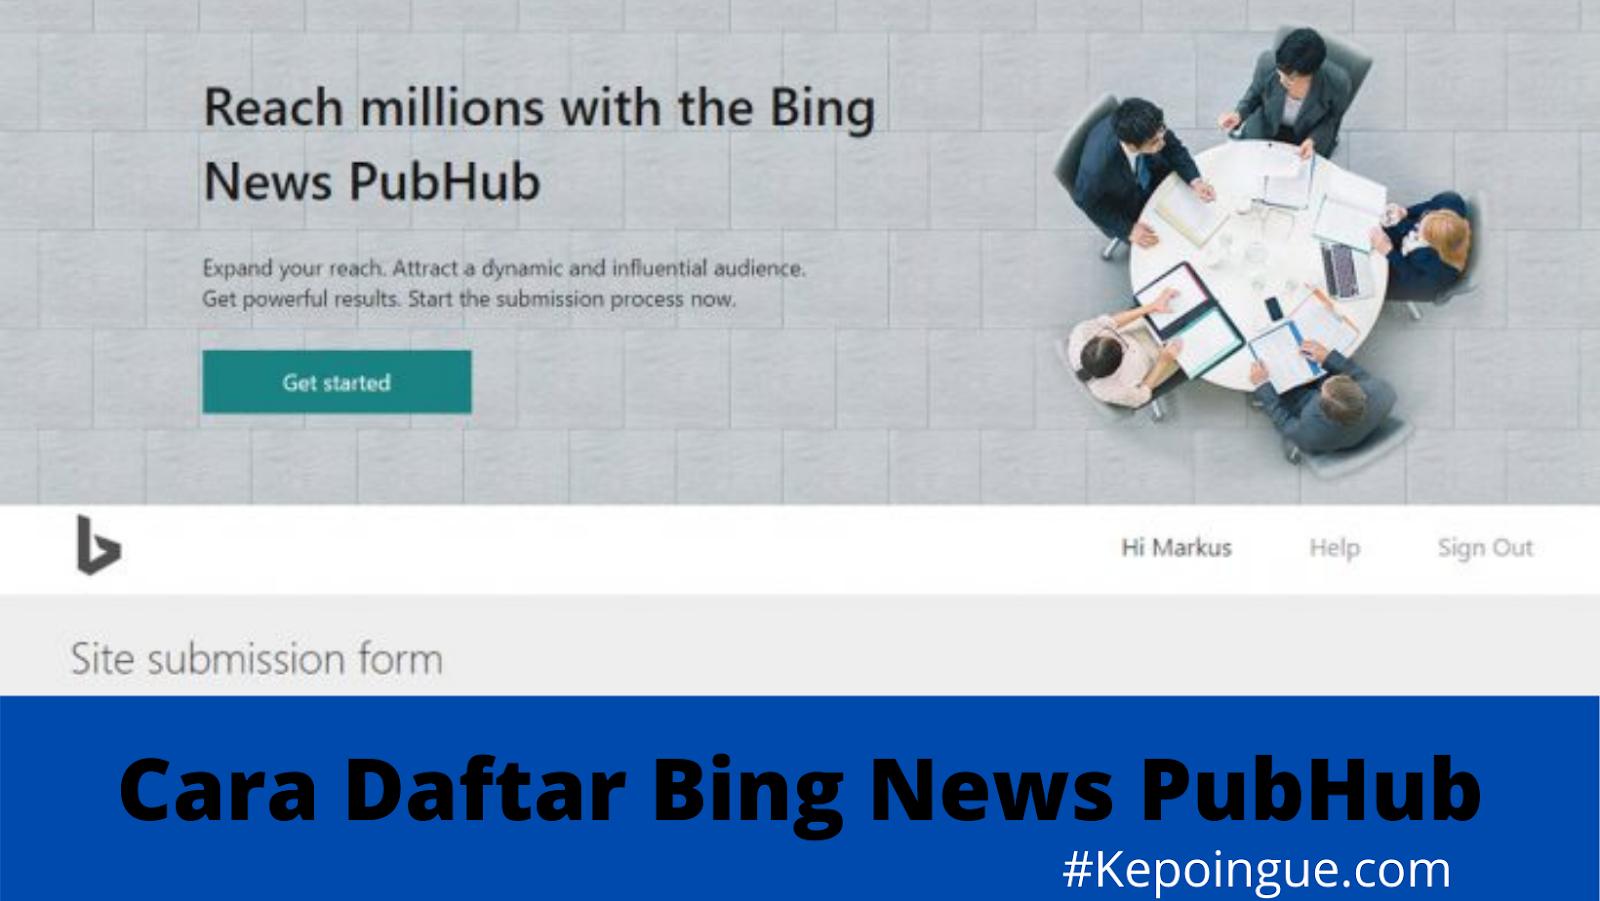 Cara Daftar Bing News PubHub